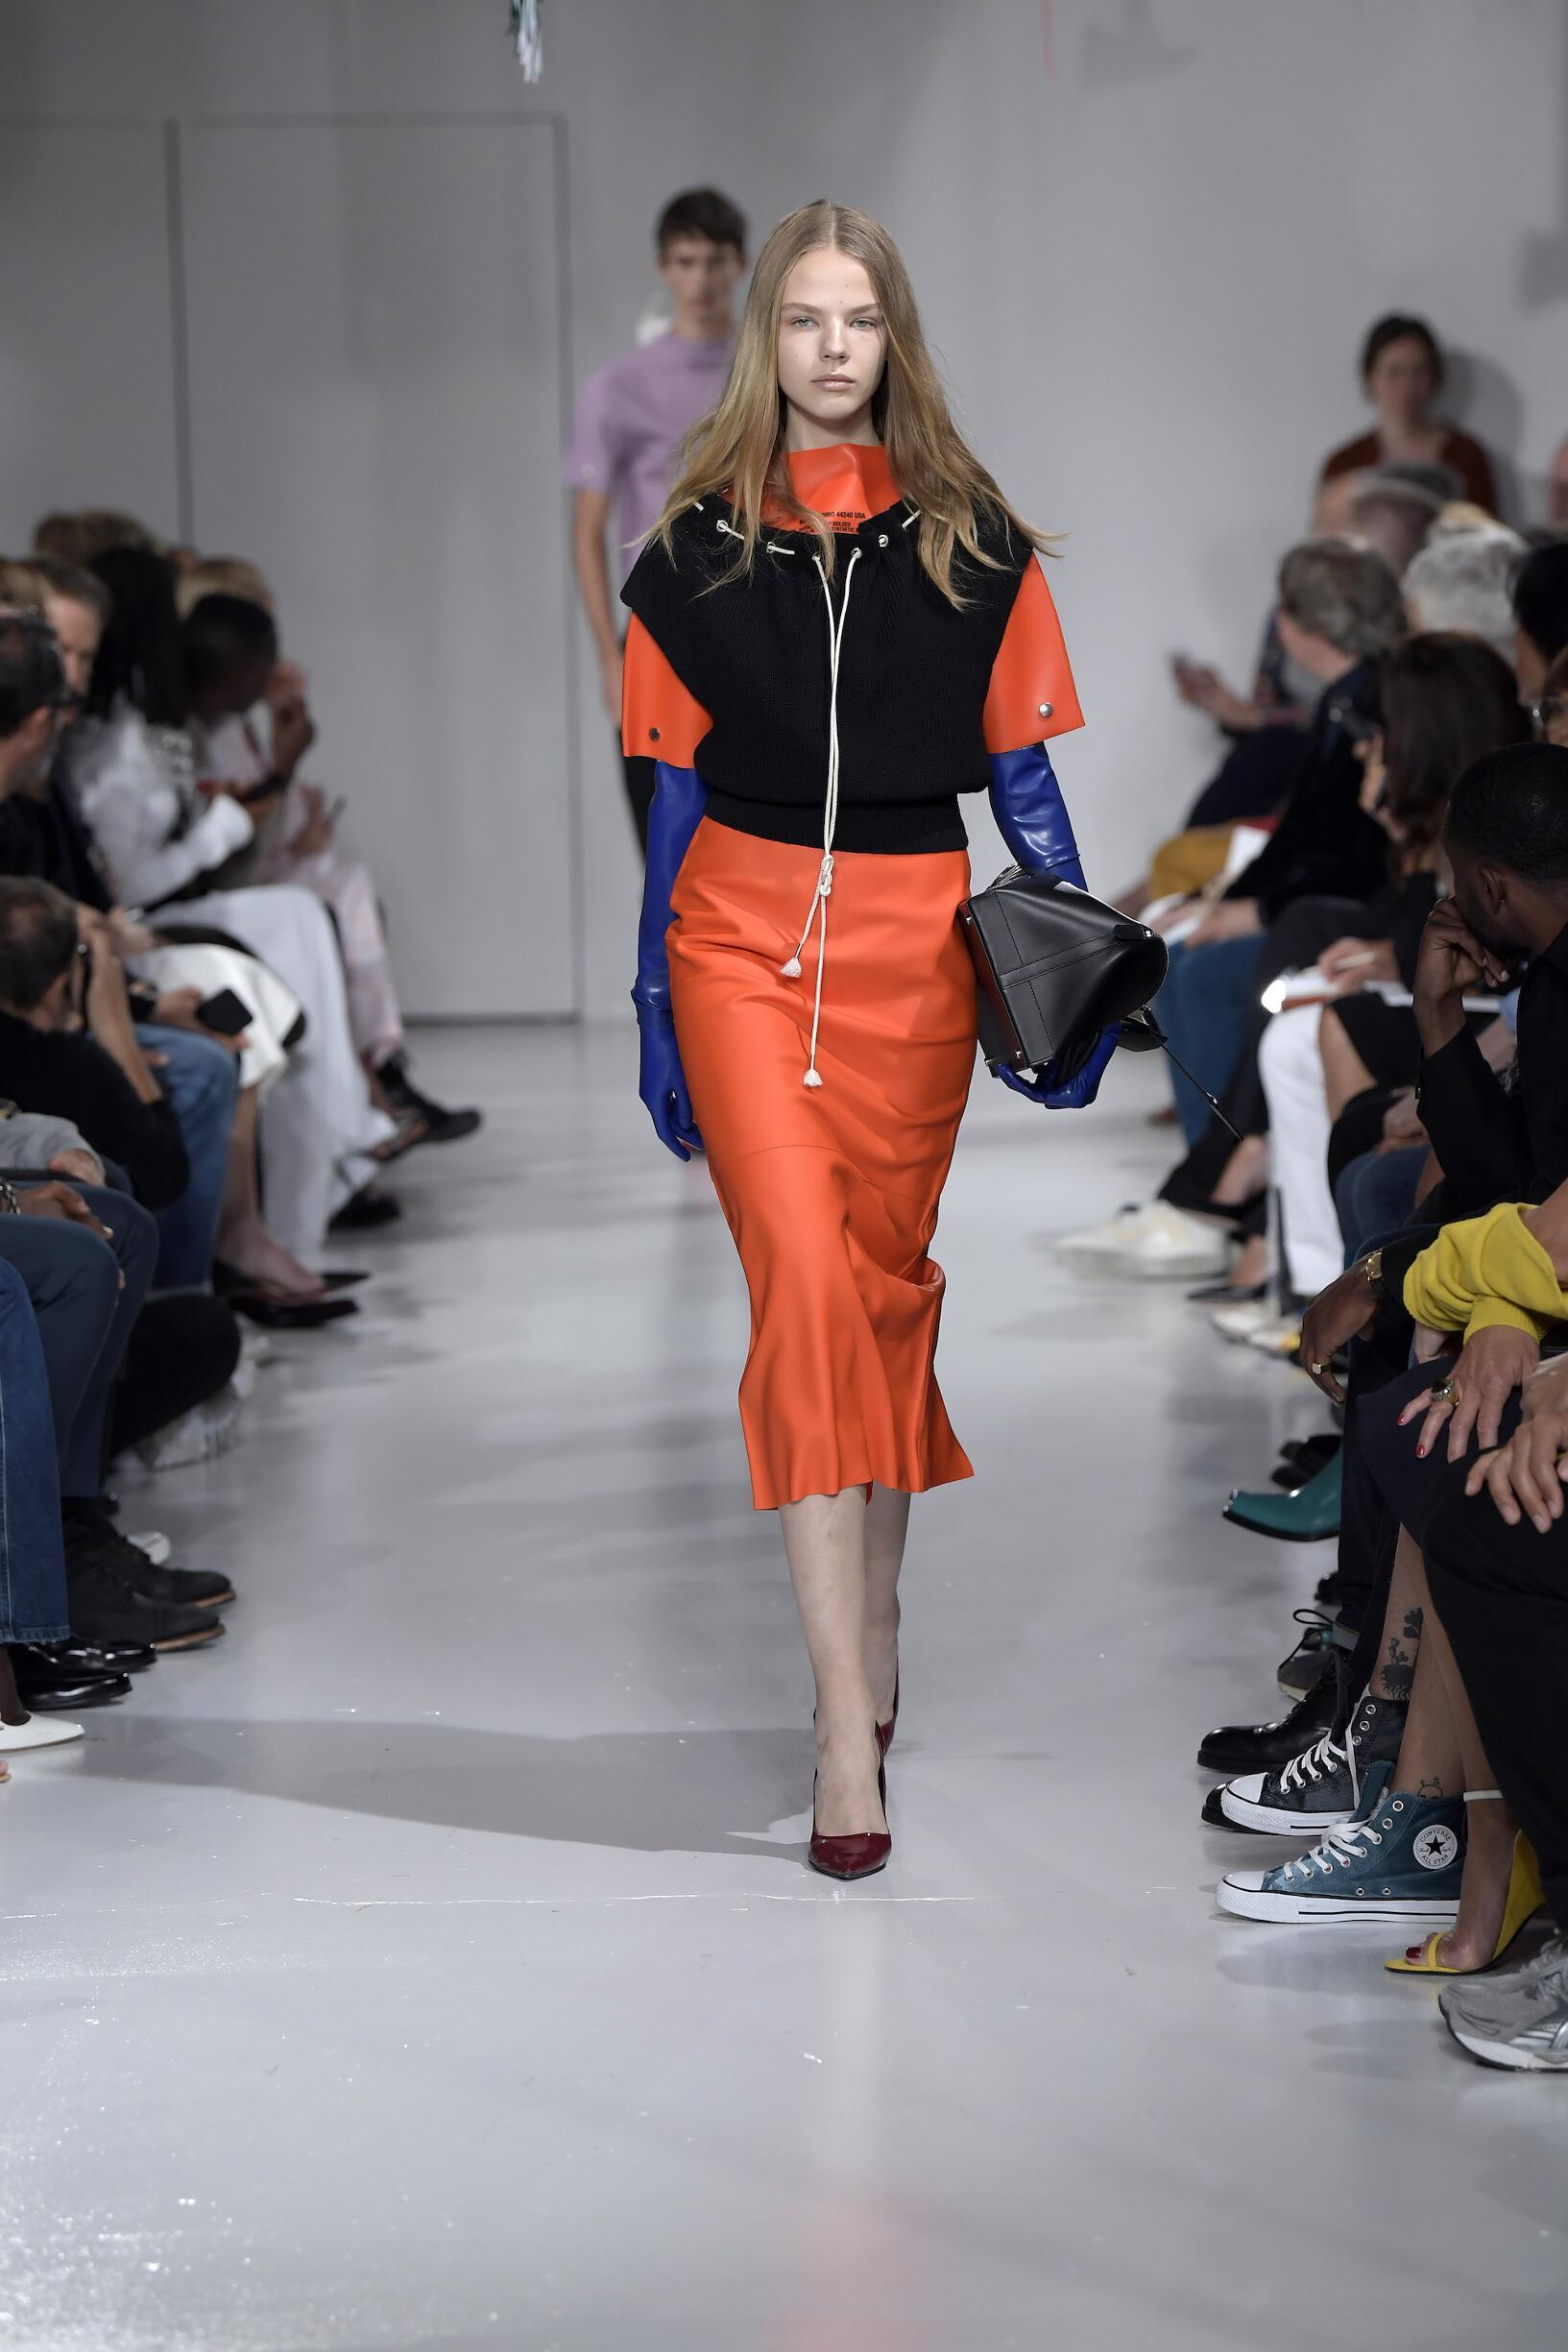 SS 2018 Calvin Klein 205W39NYC Show New York Fashion Week